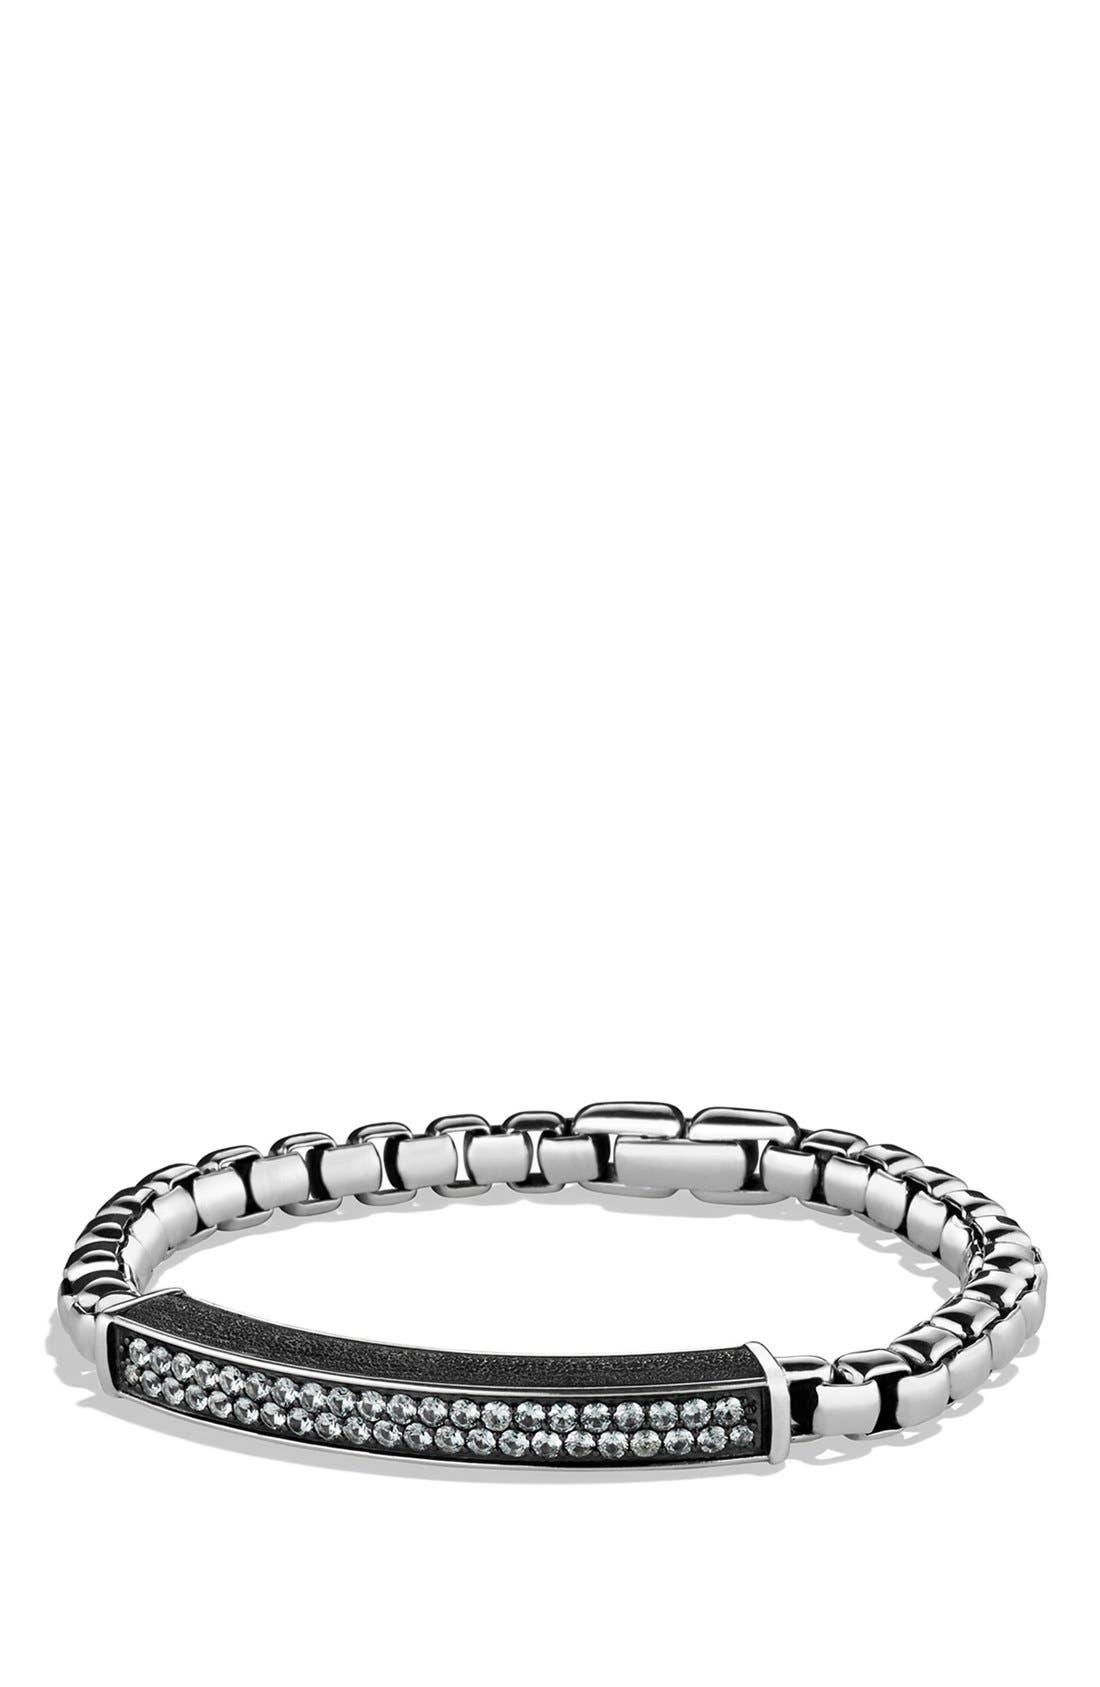 Pavé ID Bracelet with Gray Sapphires,                             Main thumbnail 1, color,                             GREY SAPPHIRE